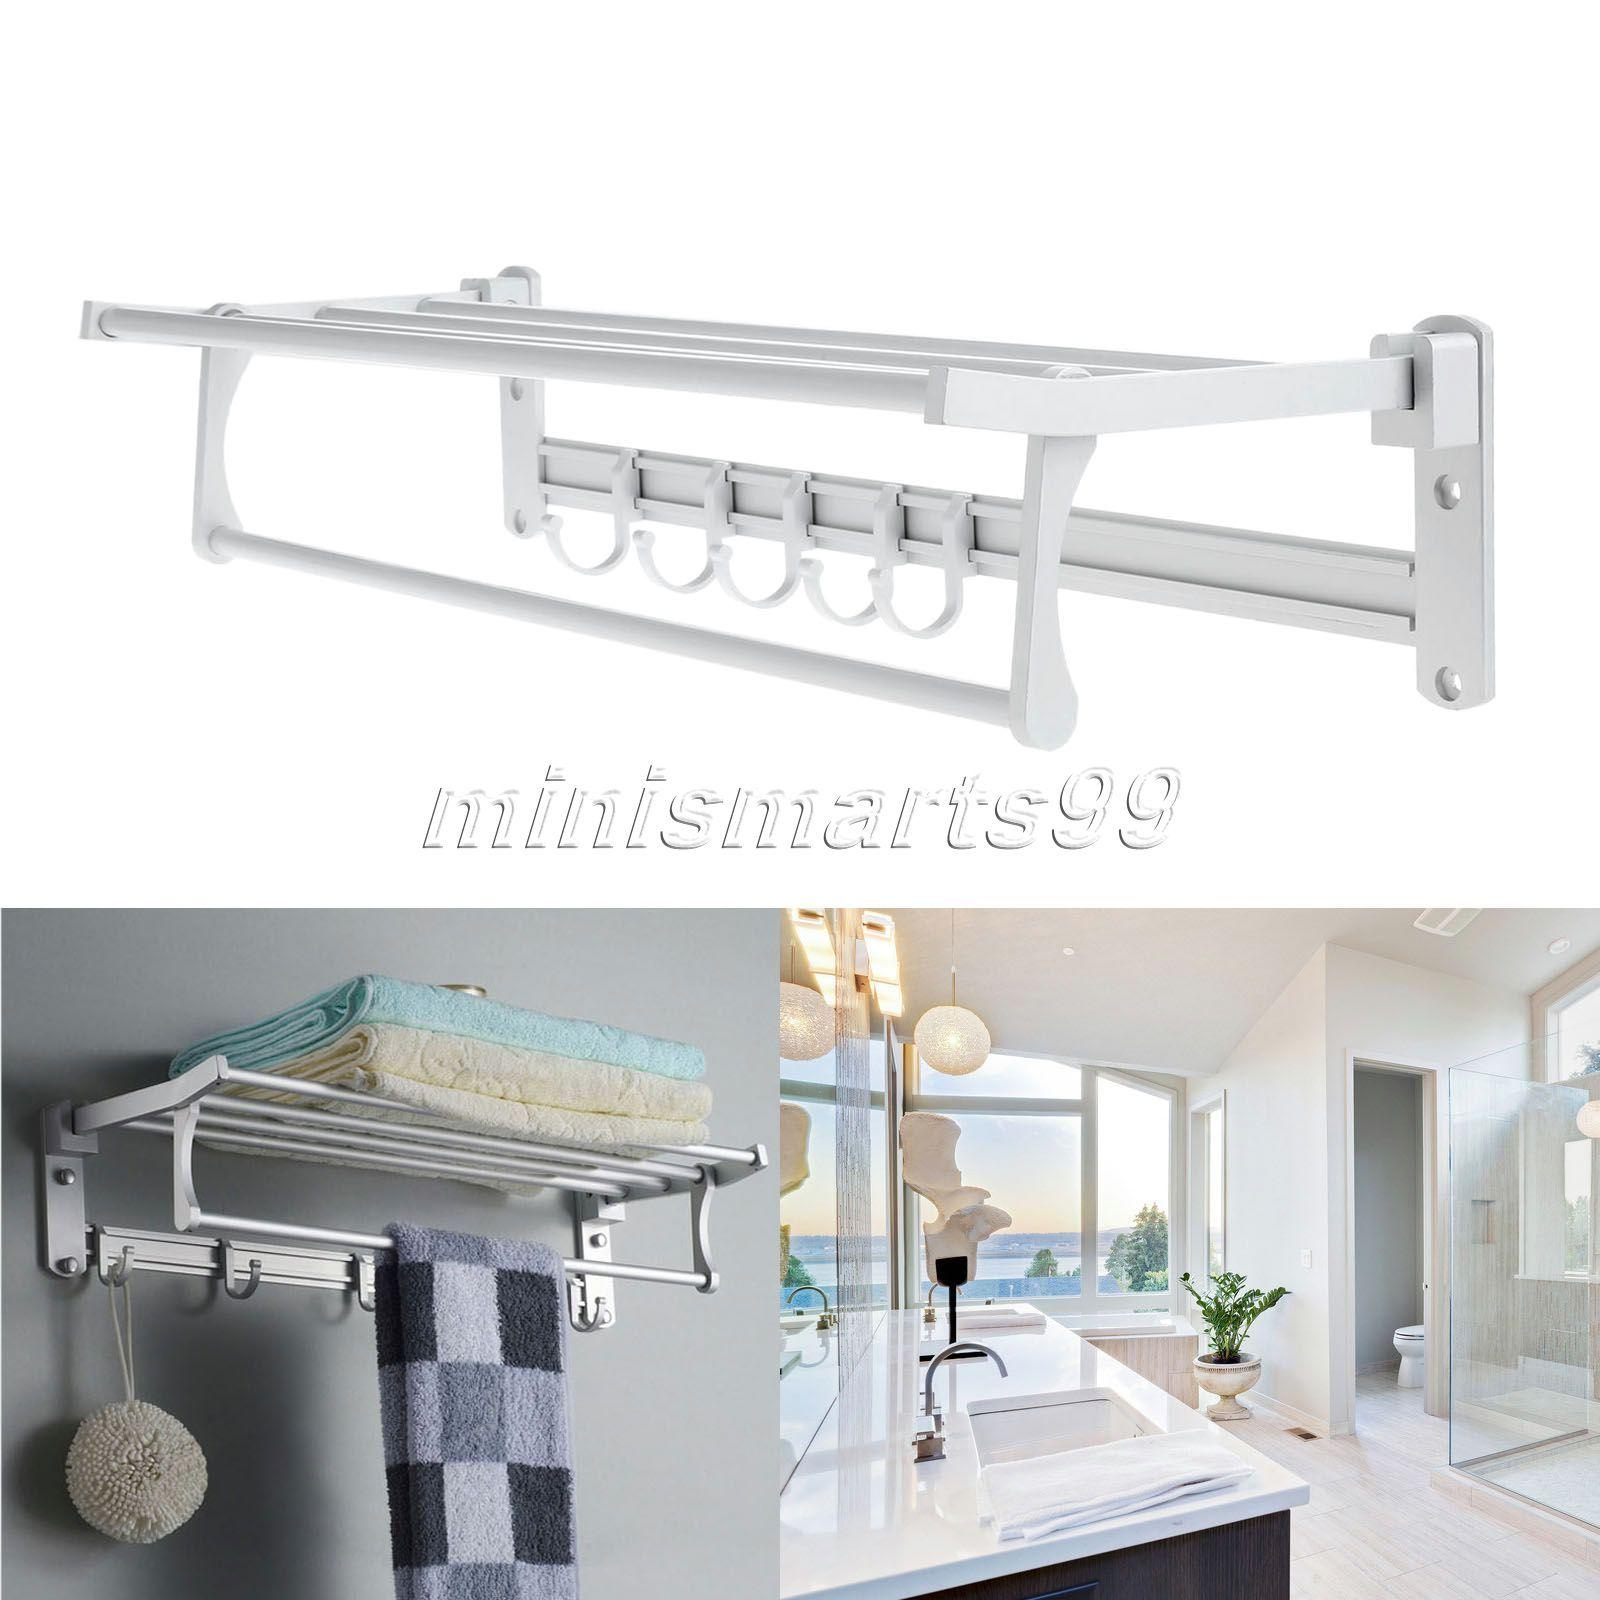 Bathroom Towel Corner Shelves Holders Aluminum Wall Mounted